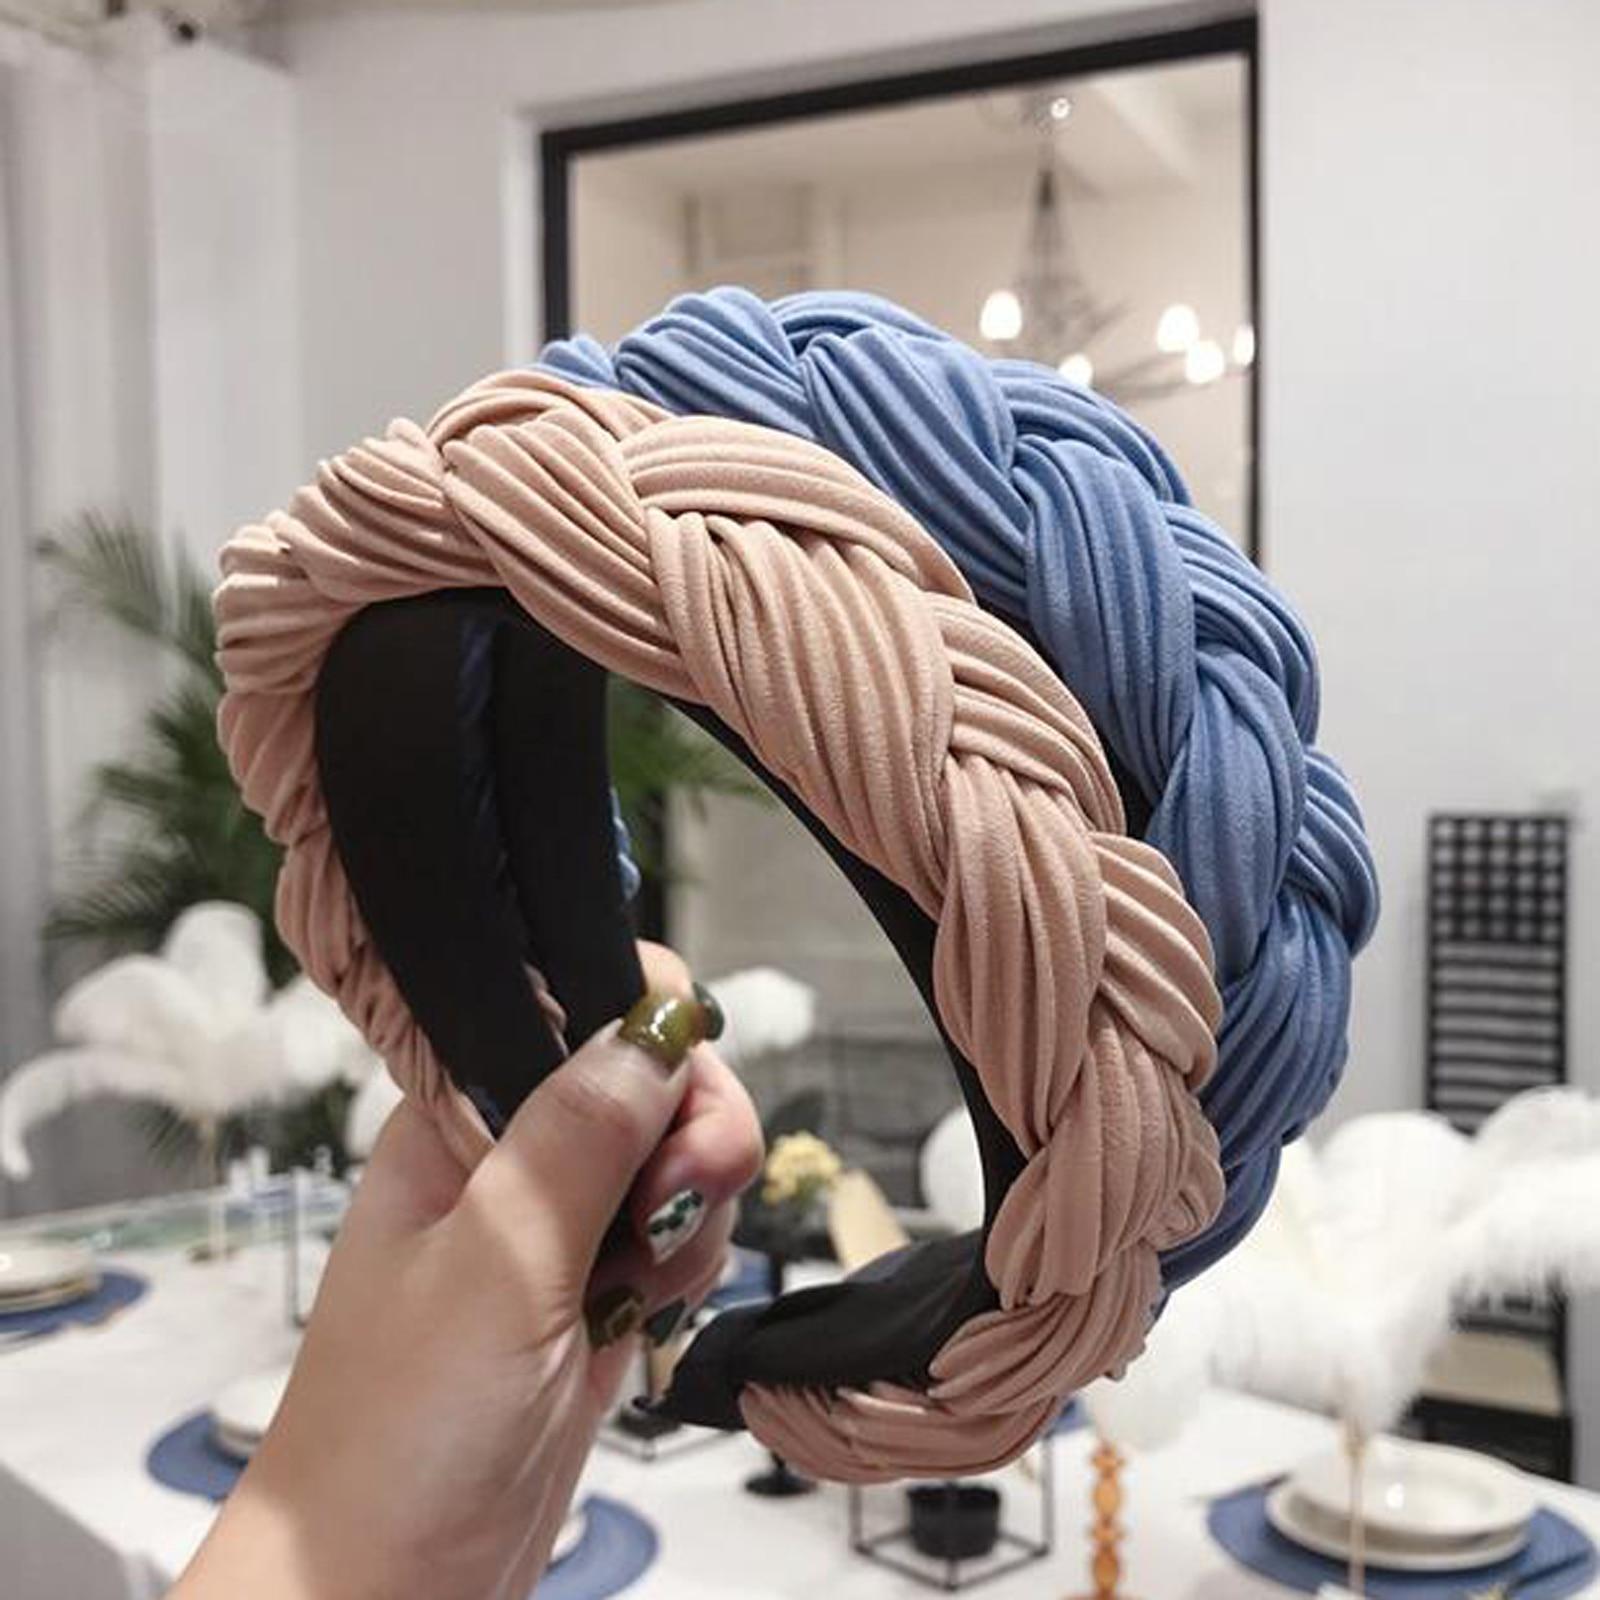 New Fashion Women Hairband Cross Knot Braid Headband Adult Autumn Winter Headwear Wide Side Turban Hair Accessories